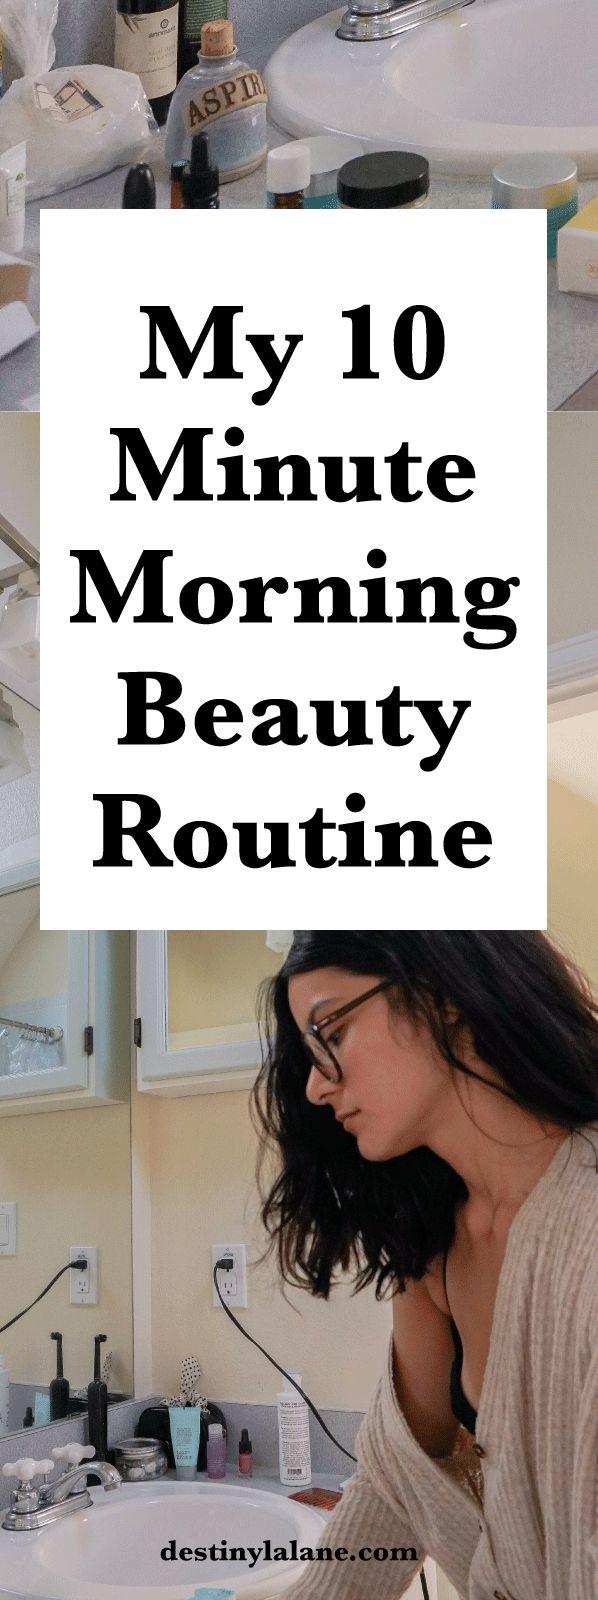 10 minute all natural beauty routine | #naturalbeauty #beautytips | destinylalane.com